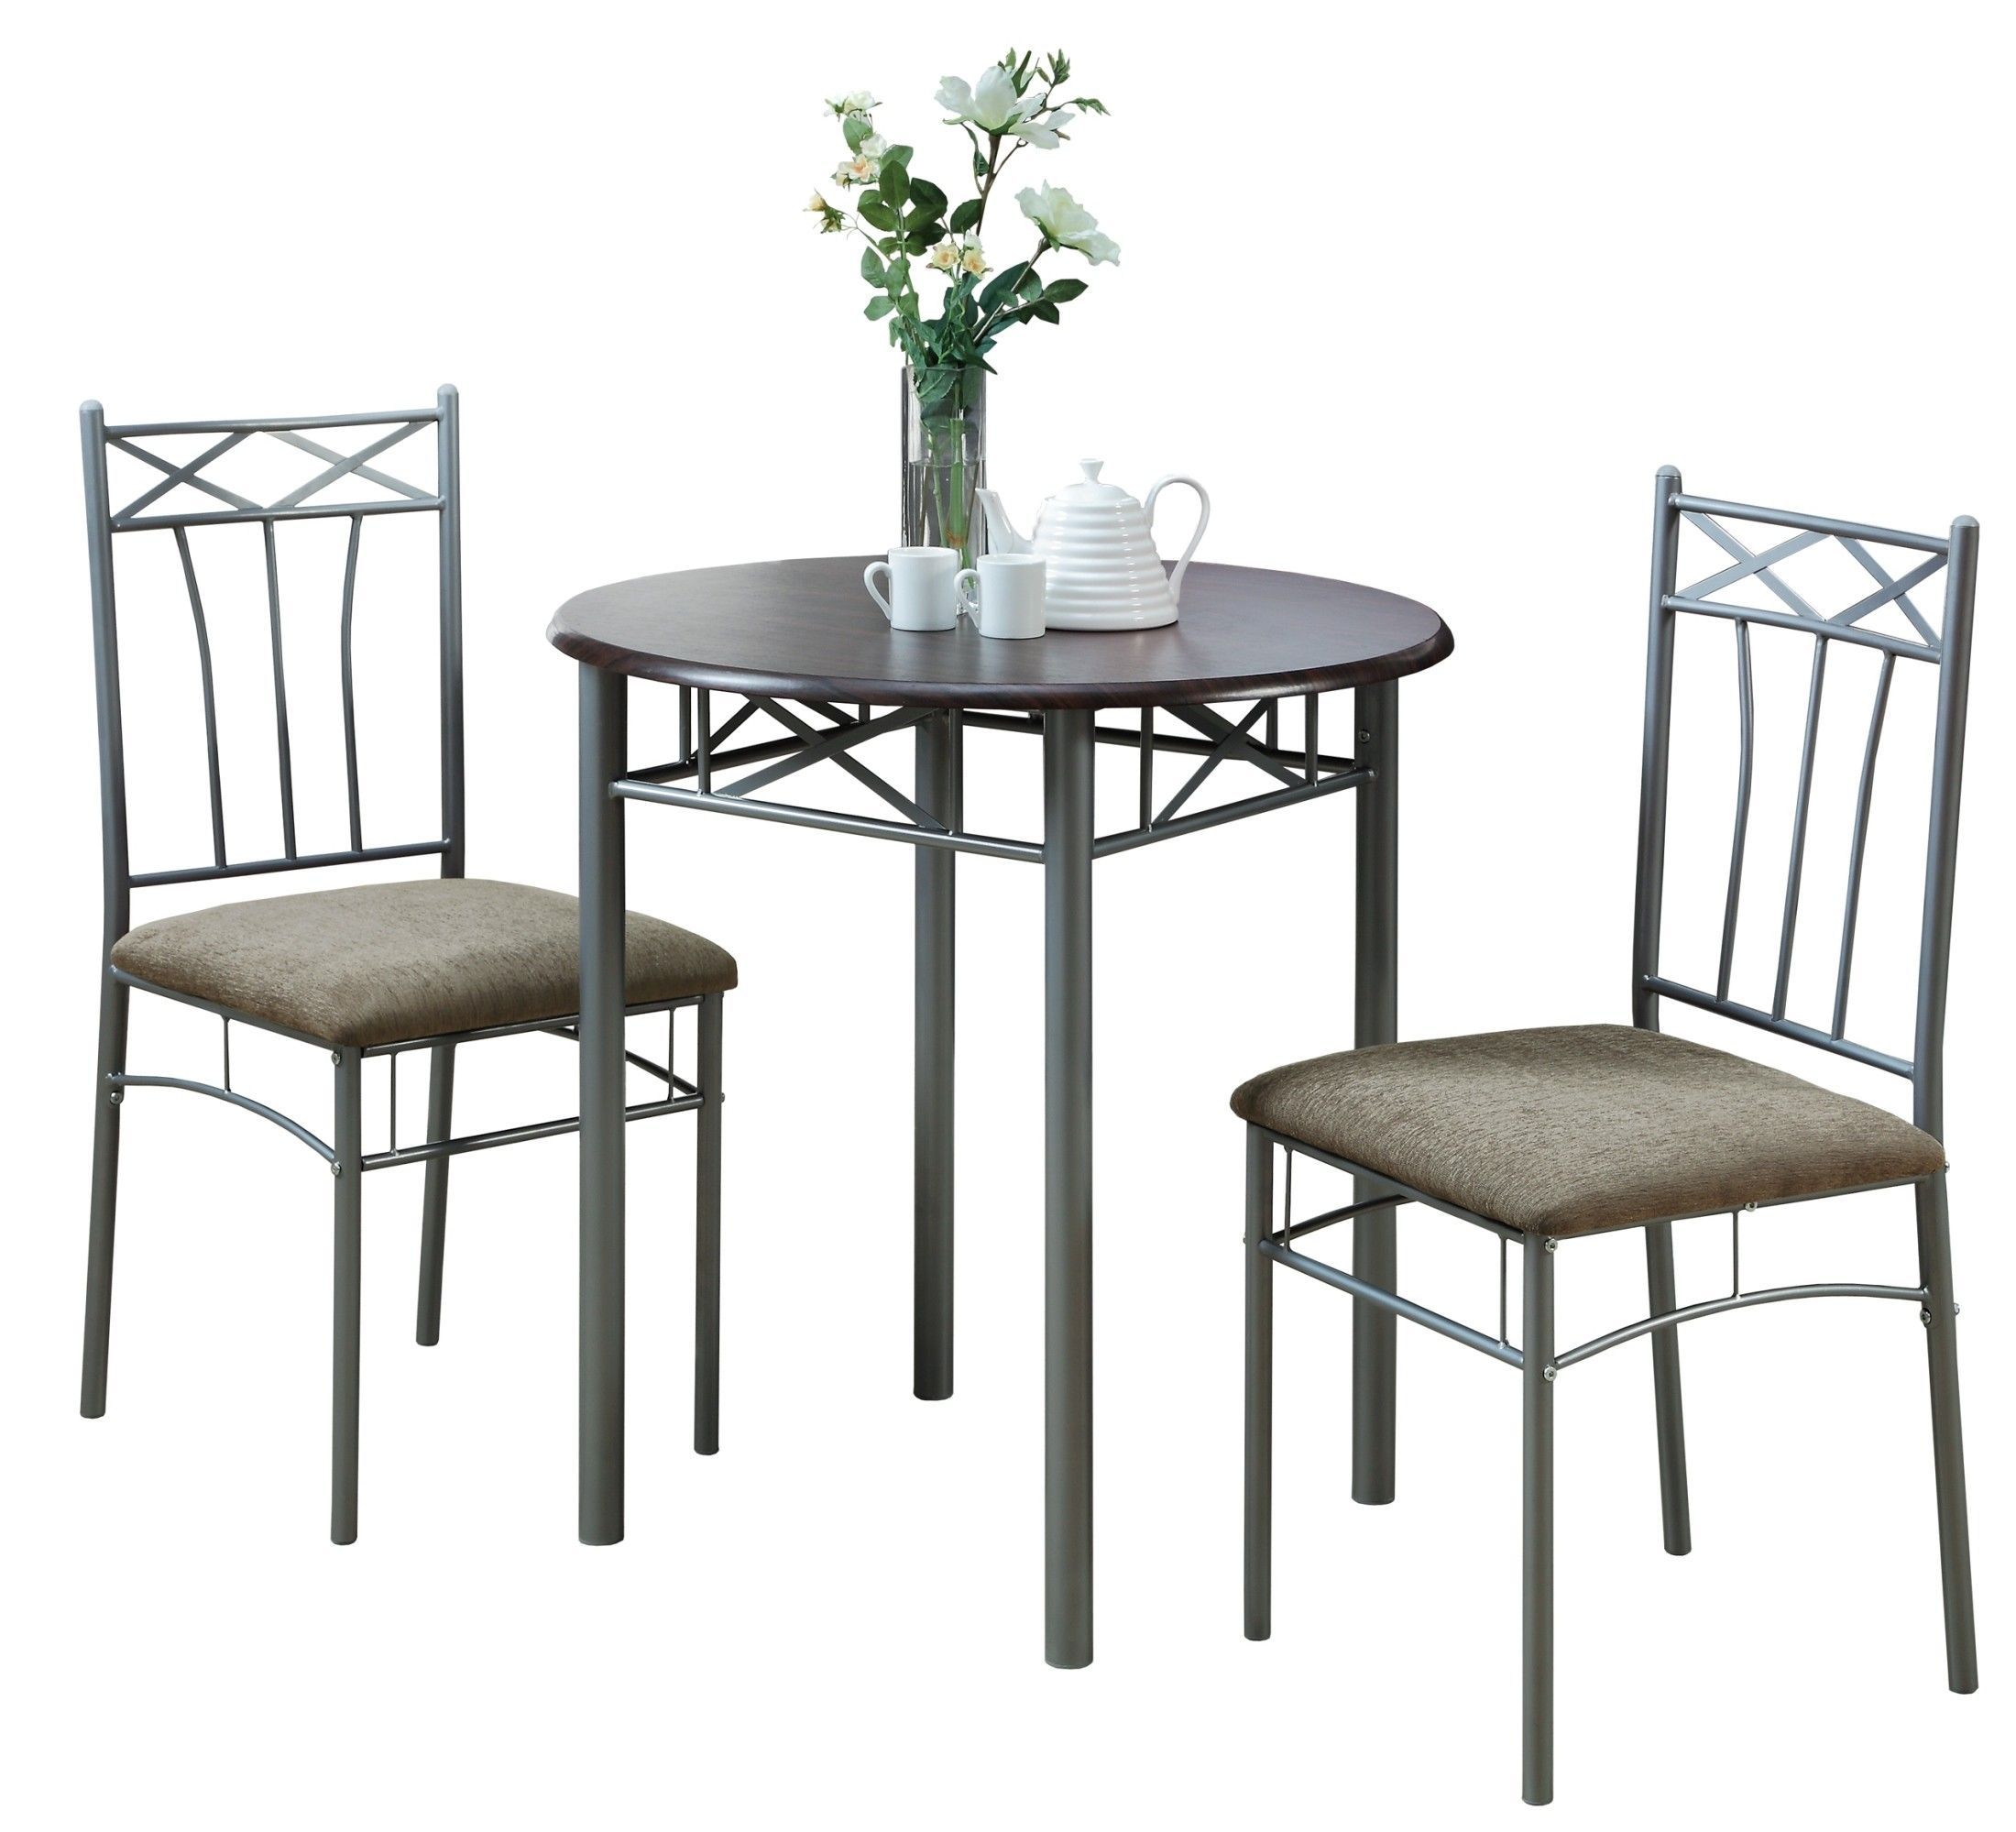 3075 cappuccino silver metal 3pcs bistro set from monarch i 3075 coleman furniture. Black Bedroom Furniture Sets. Home Design Ideas